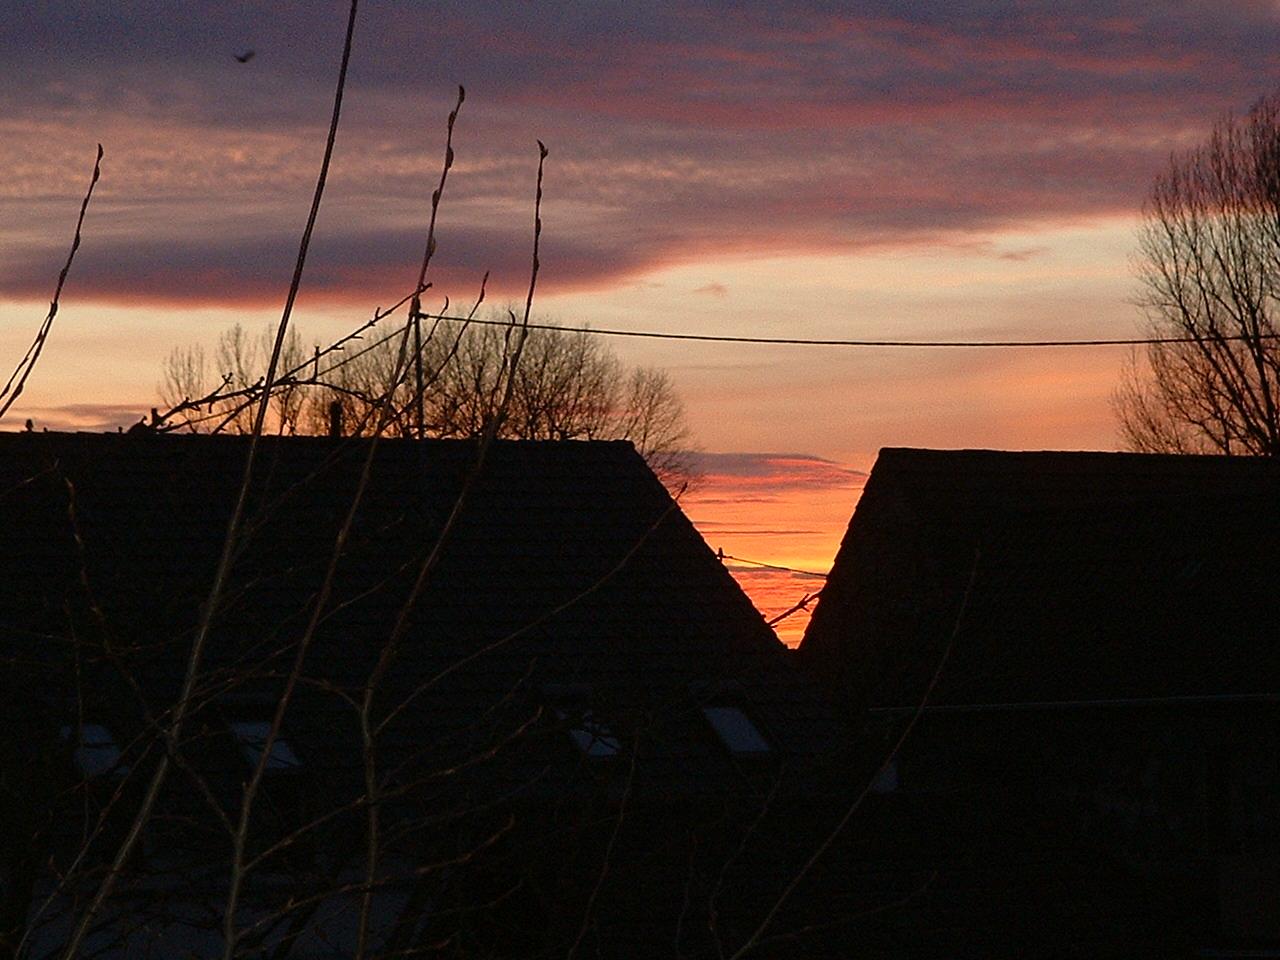 Sonnenuntergang Januar 2011